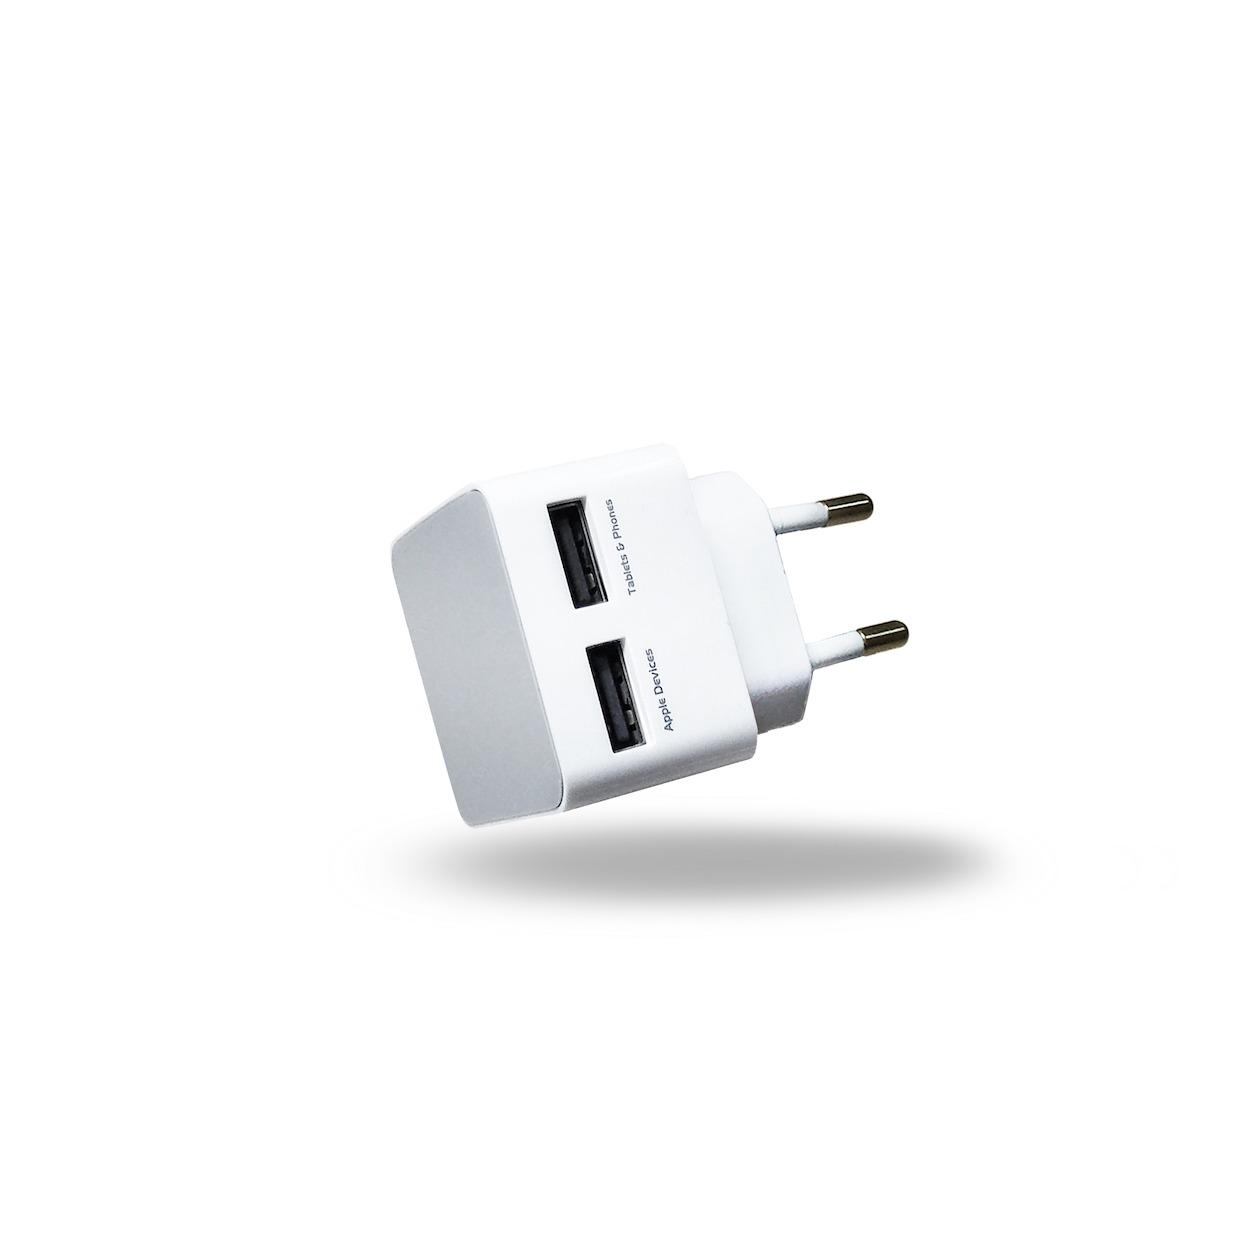 Afbeelding van Azuri oplader Thuislader 2 x USB-adapter wit